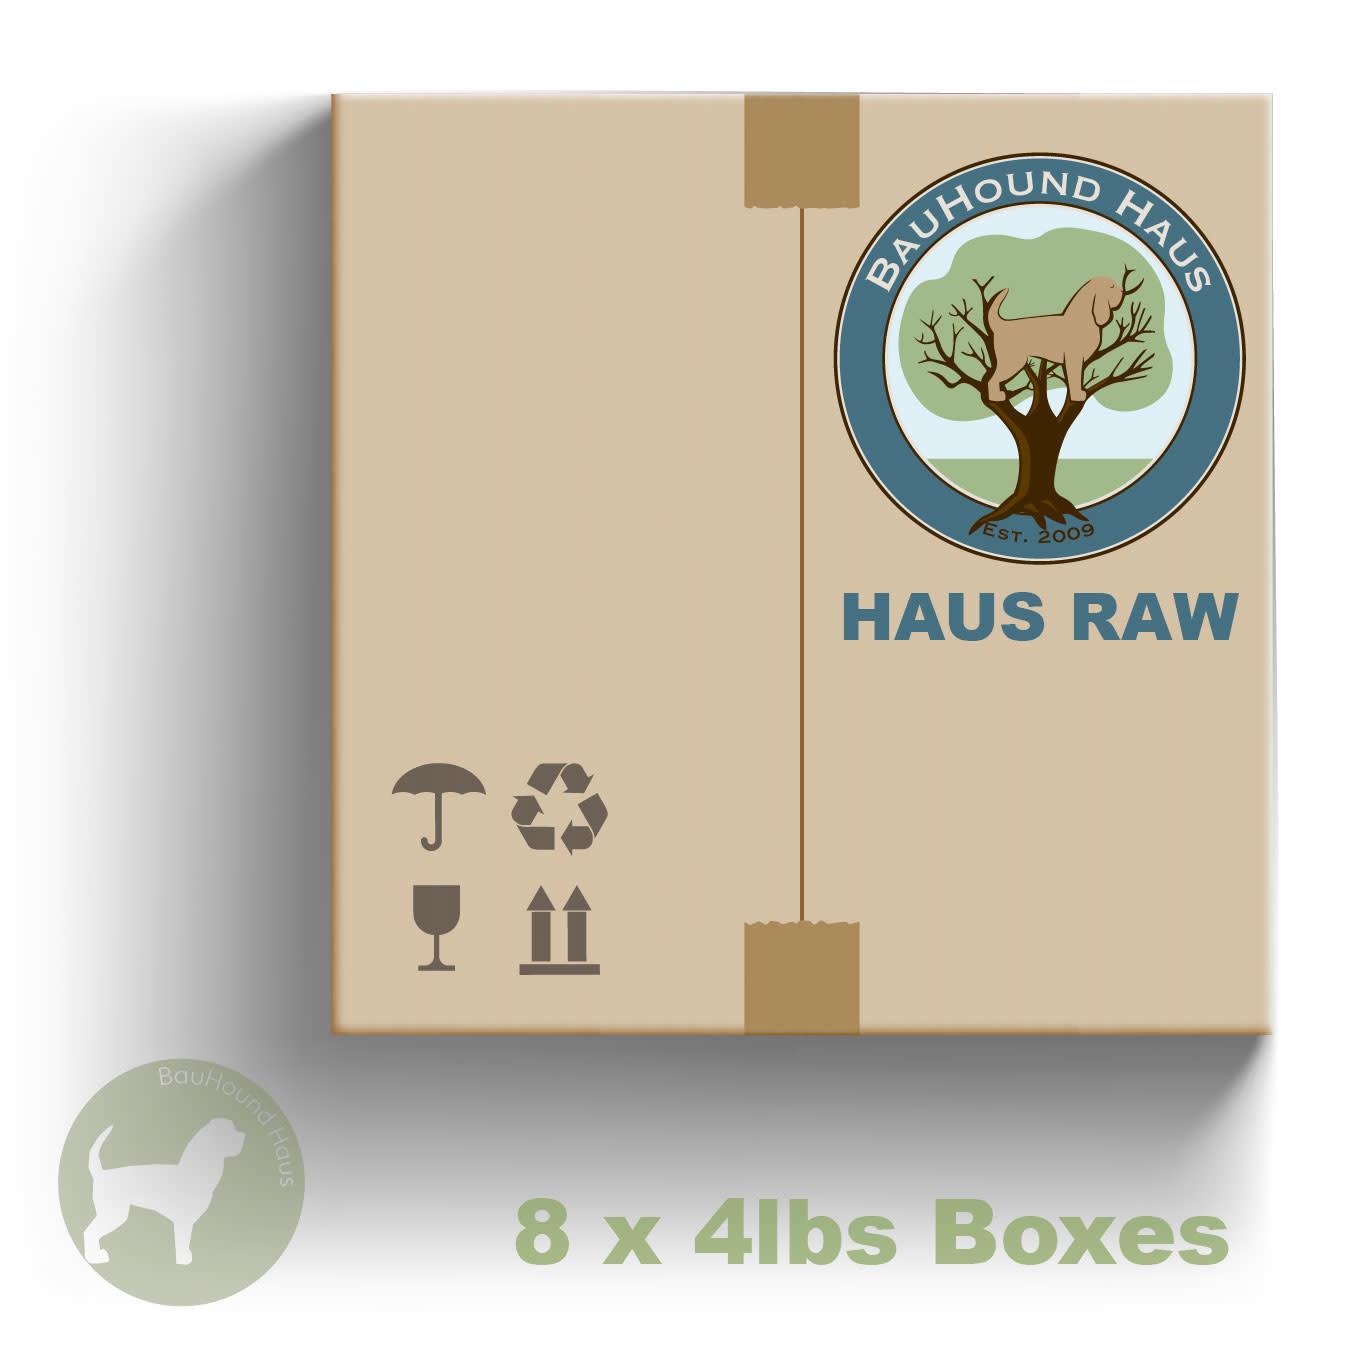 BauHound Haus BauHound Haus RAW Duck Dog Food, 32lb